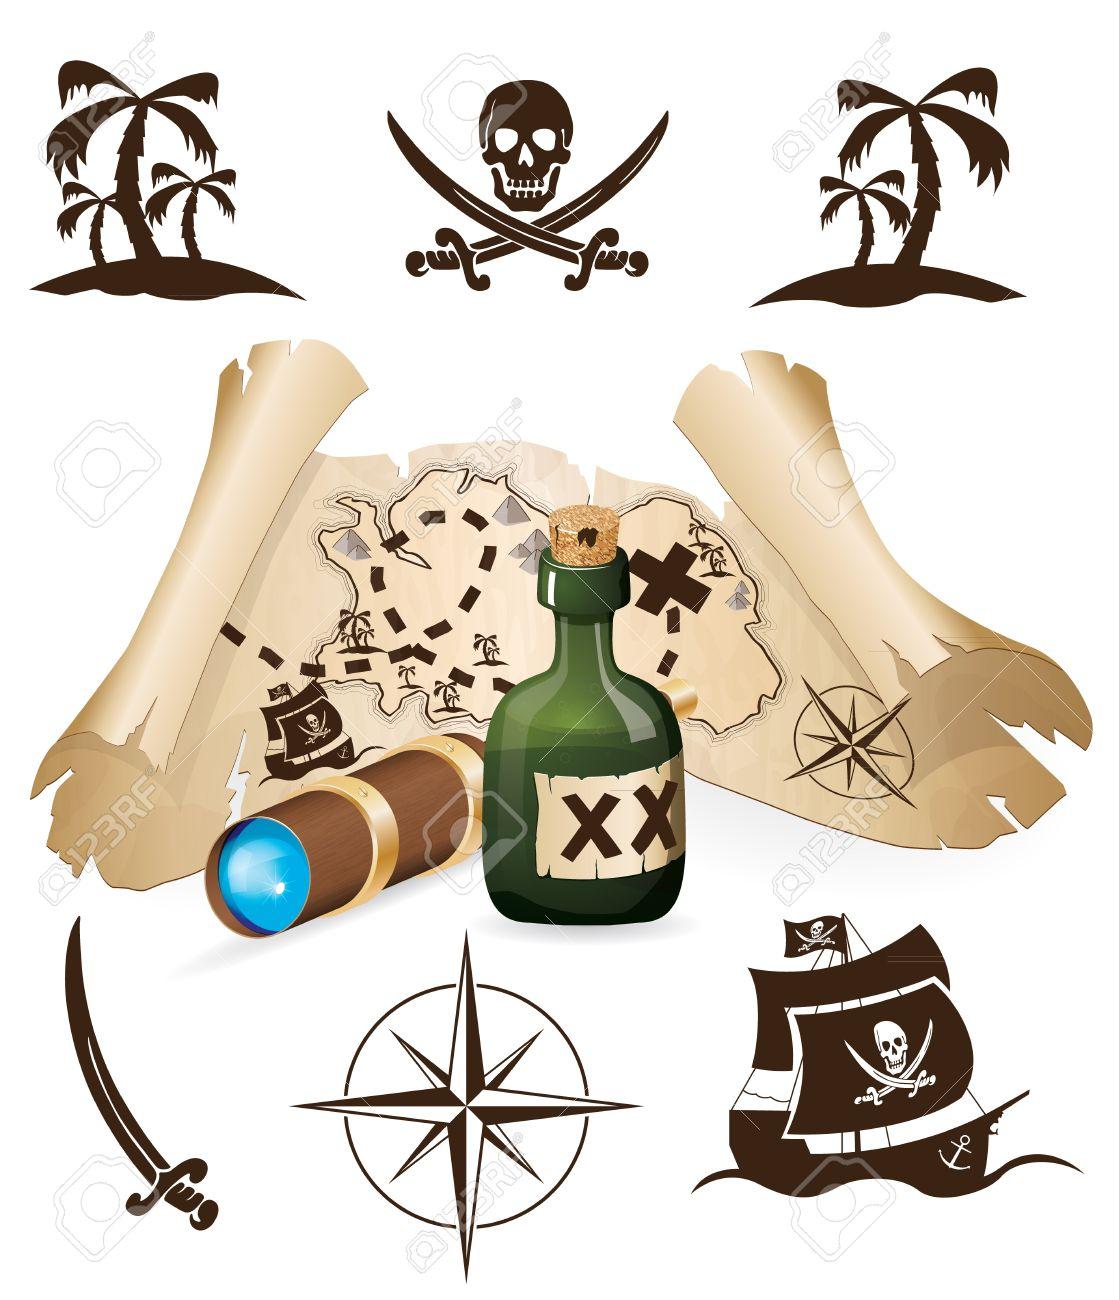 Treasure map, pirate collection - 12711039